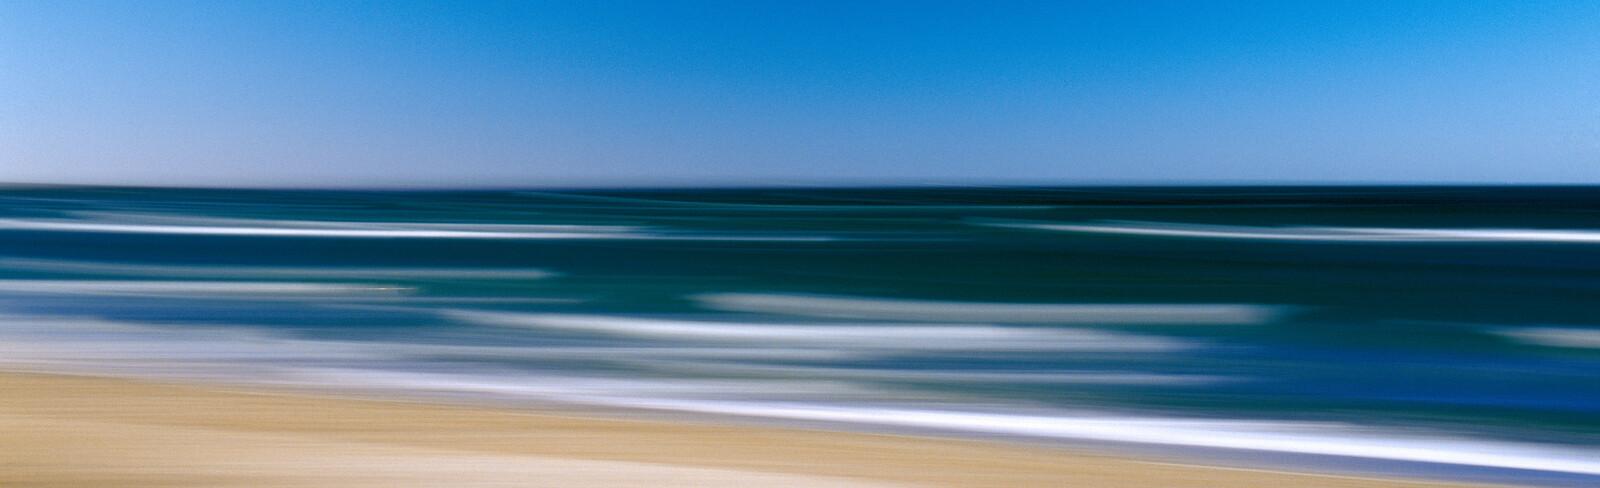 State Beach - Alison Shaw